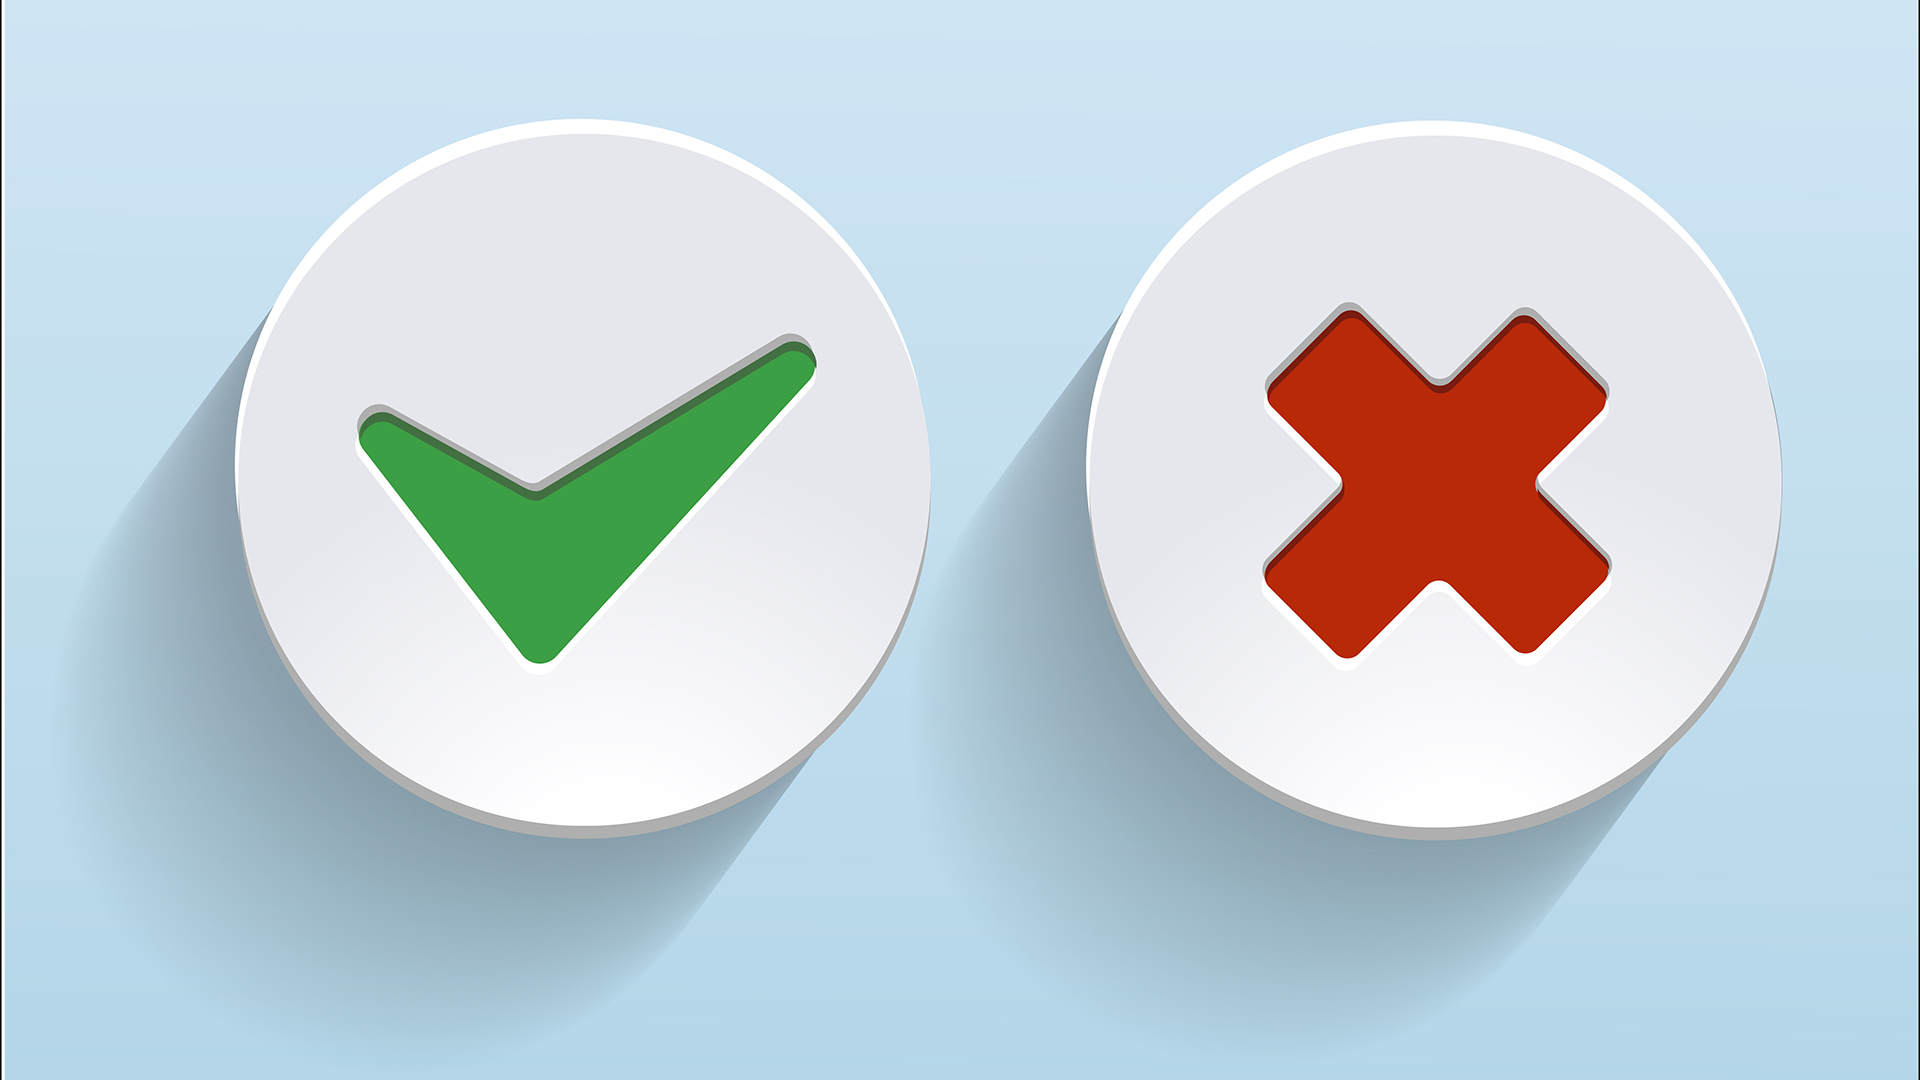 Vector Yes and No check marks on circles